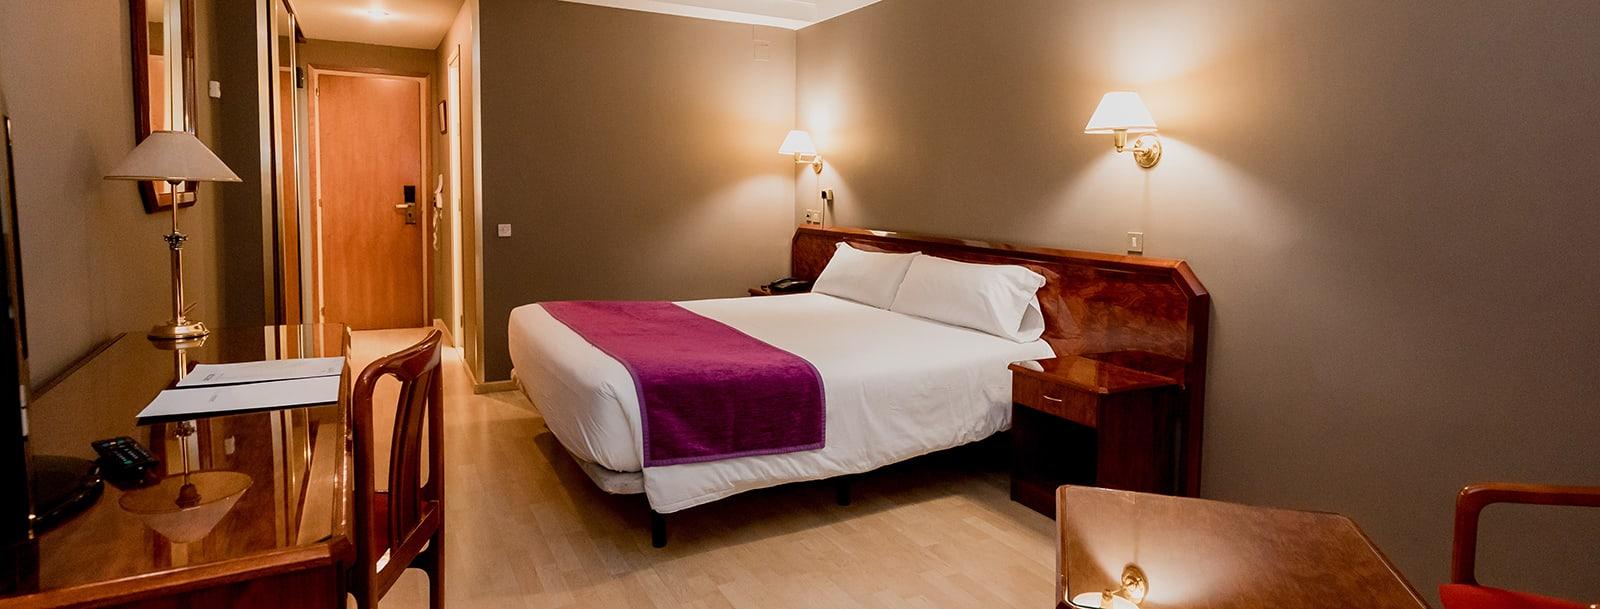 Quartos Hotel Tulip Inn Andorra Delfos